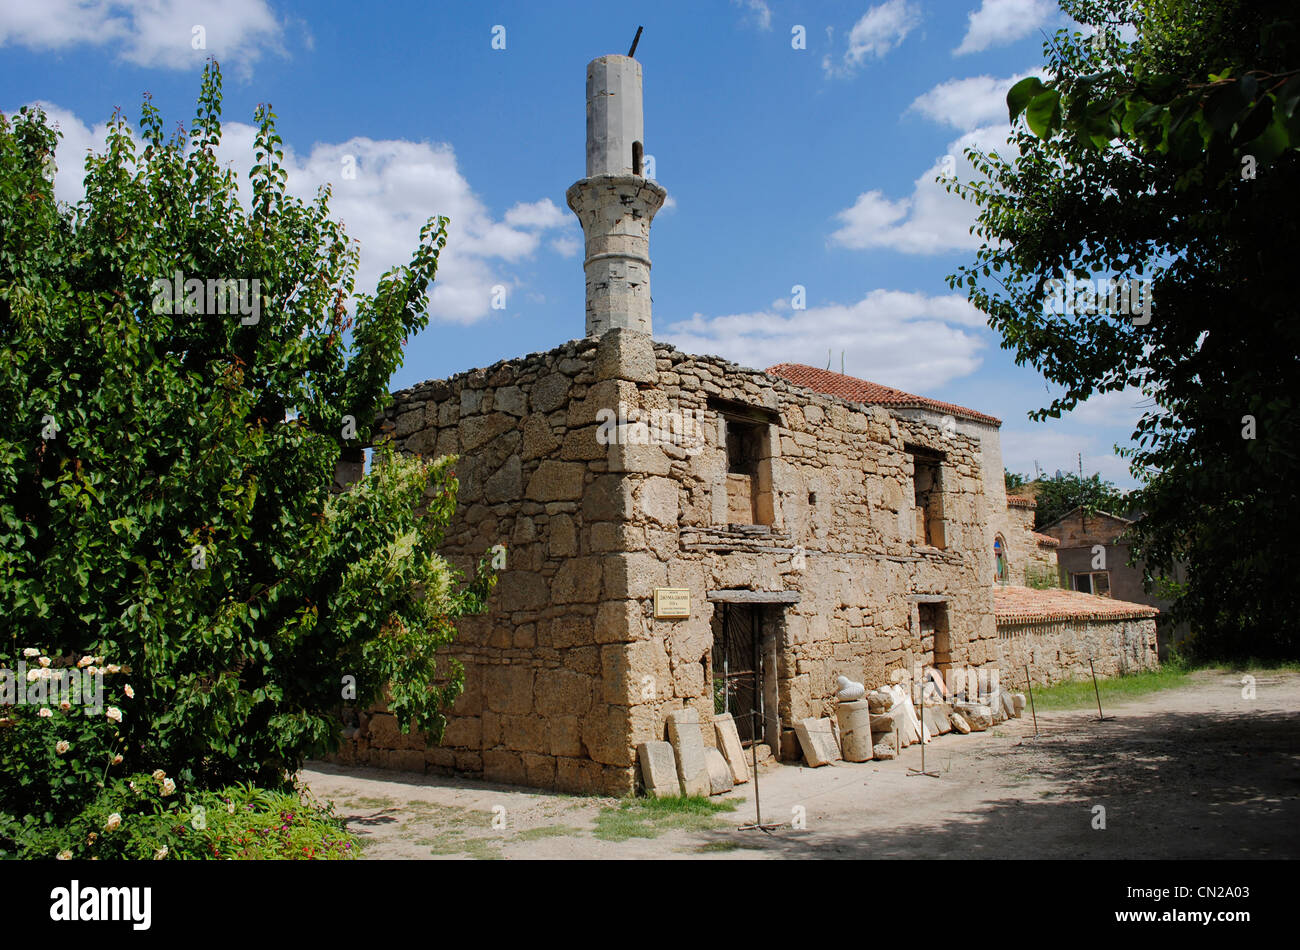 Ukraine. Autonomous Republic of Crimea. Yevpatoria. Dervish Tekke monastery. 15th century. Exterior. - Stock Image